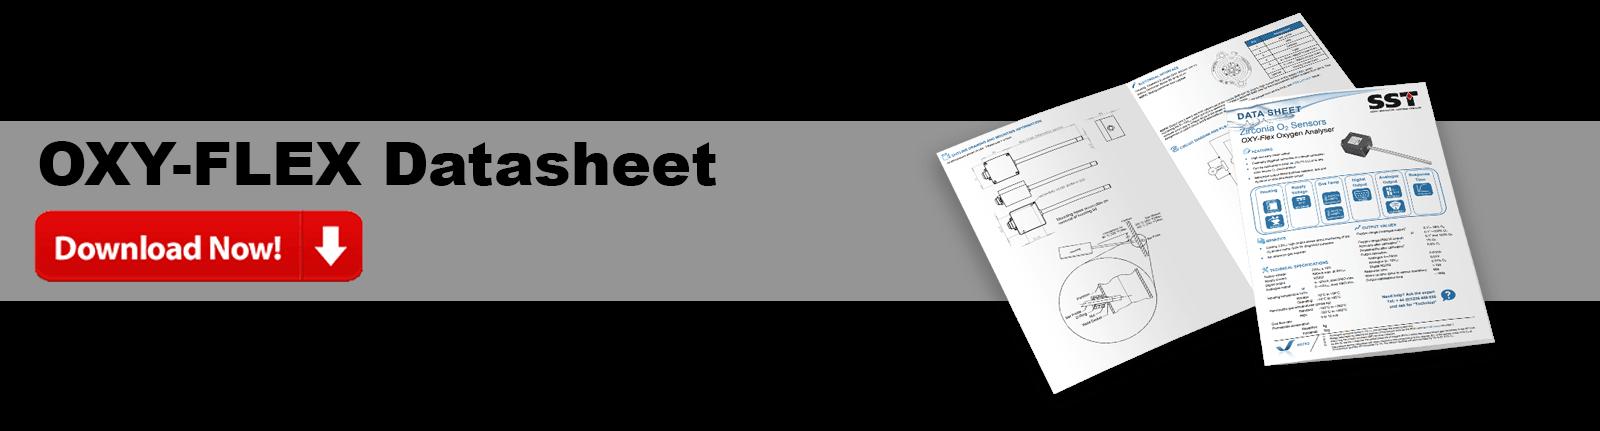 OXY-FLEX Datasheet Download